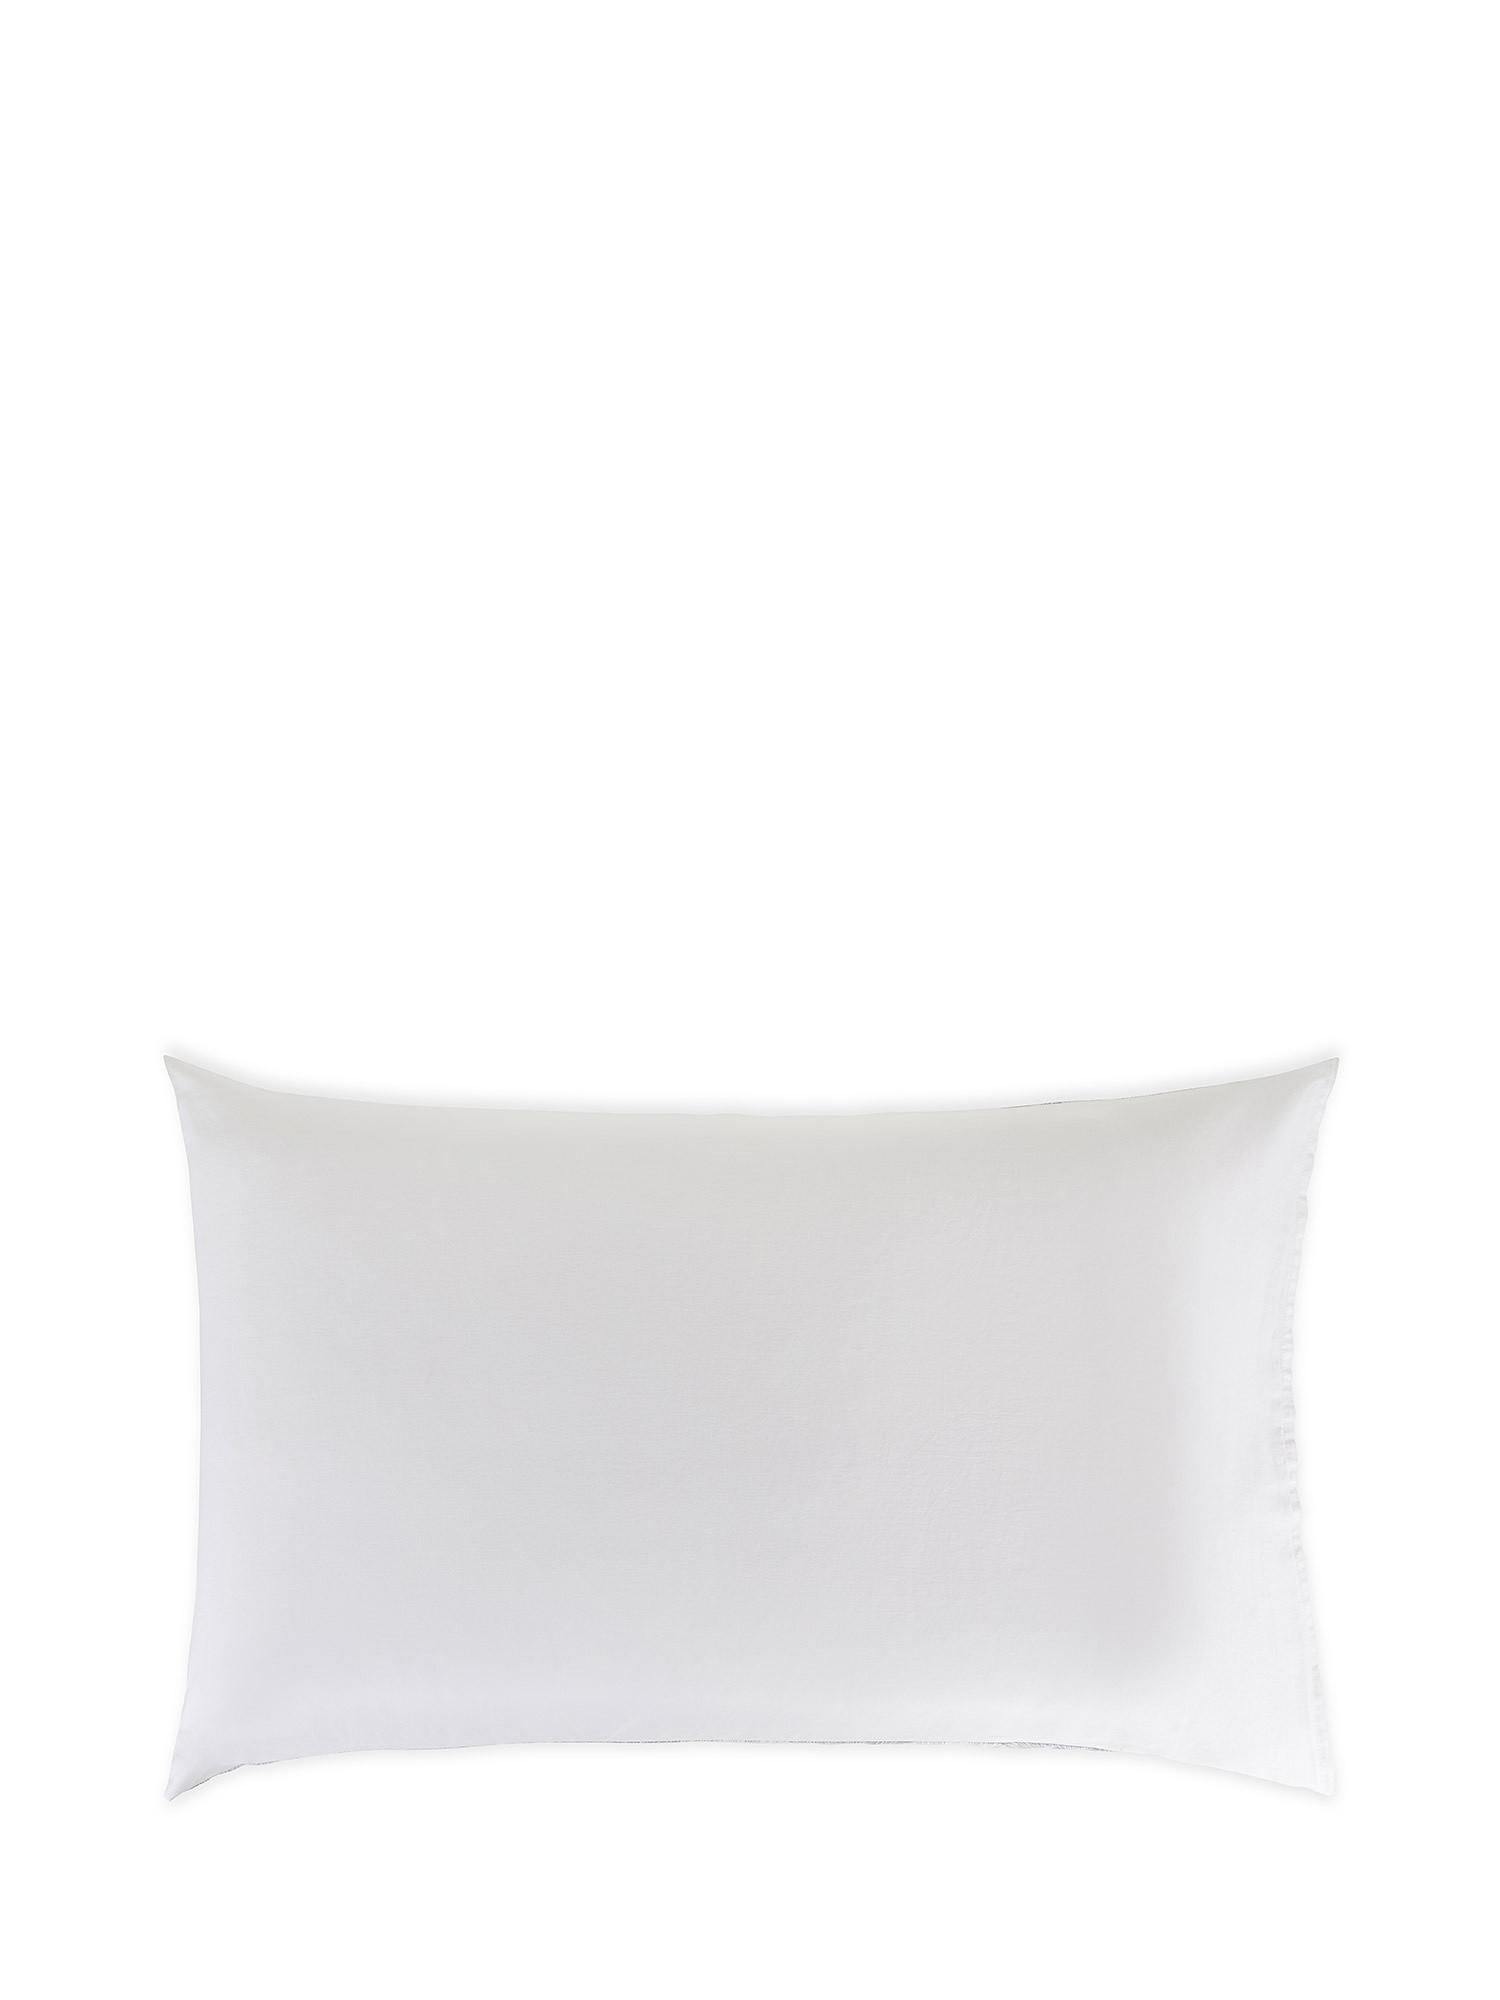 Federa raso di cotone fantasia Ginkgo, Bianco, large image number 1